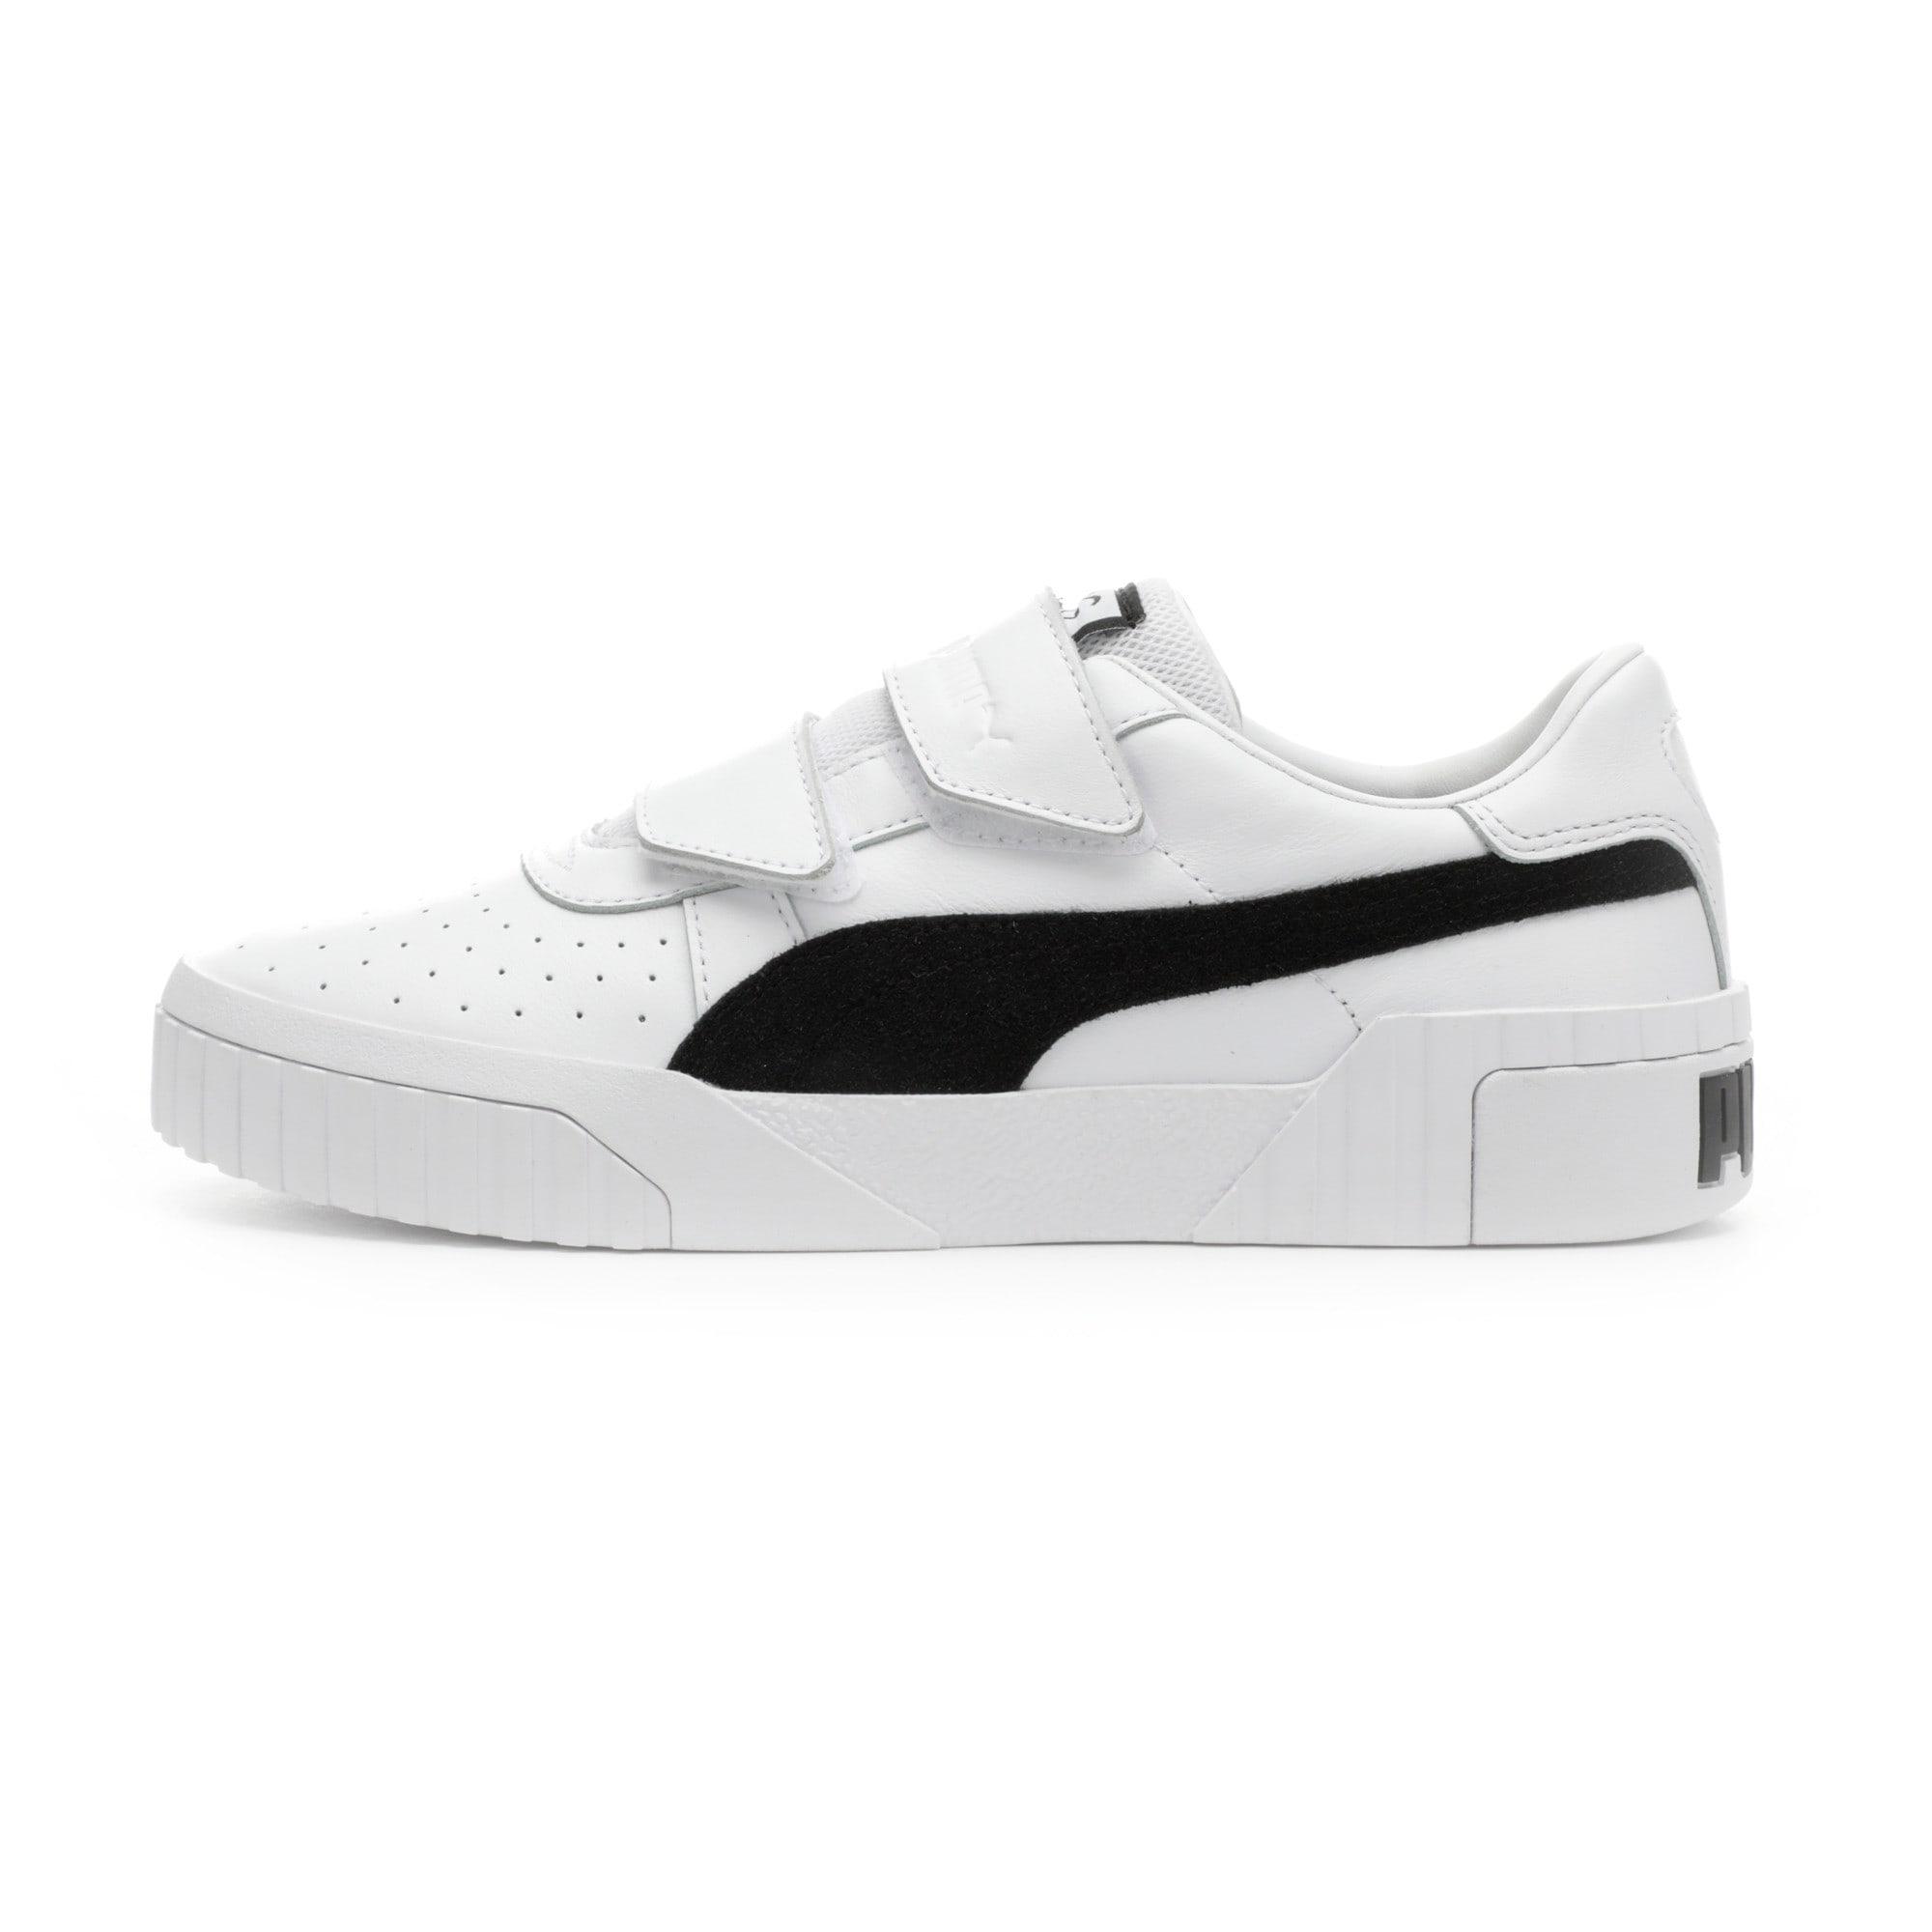 Thumbnail 1 of SG x Cali B+W Women's Sneakers, Puma White-Puma Black, medium